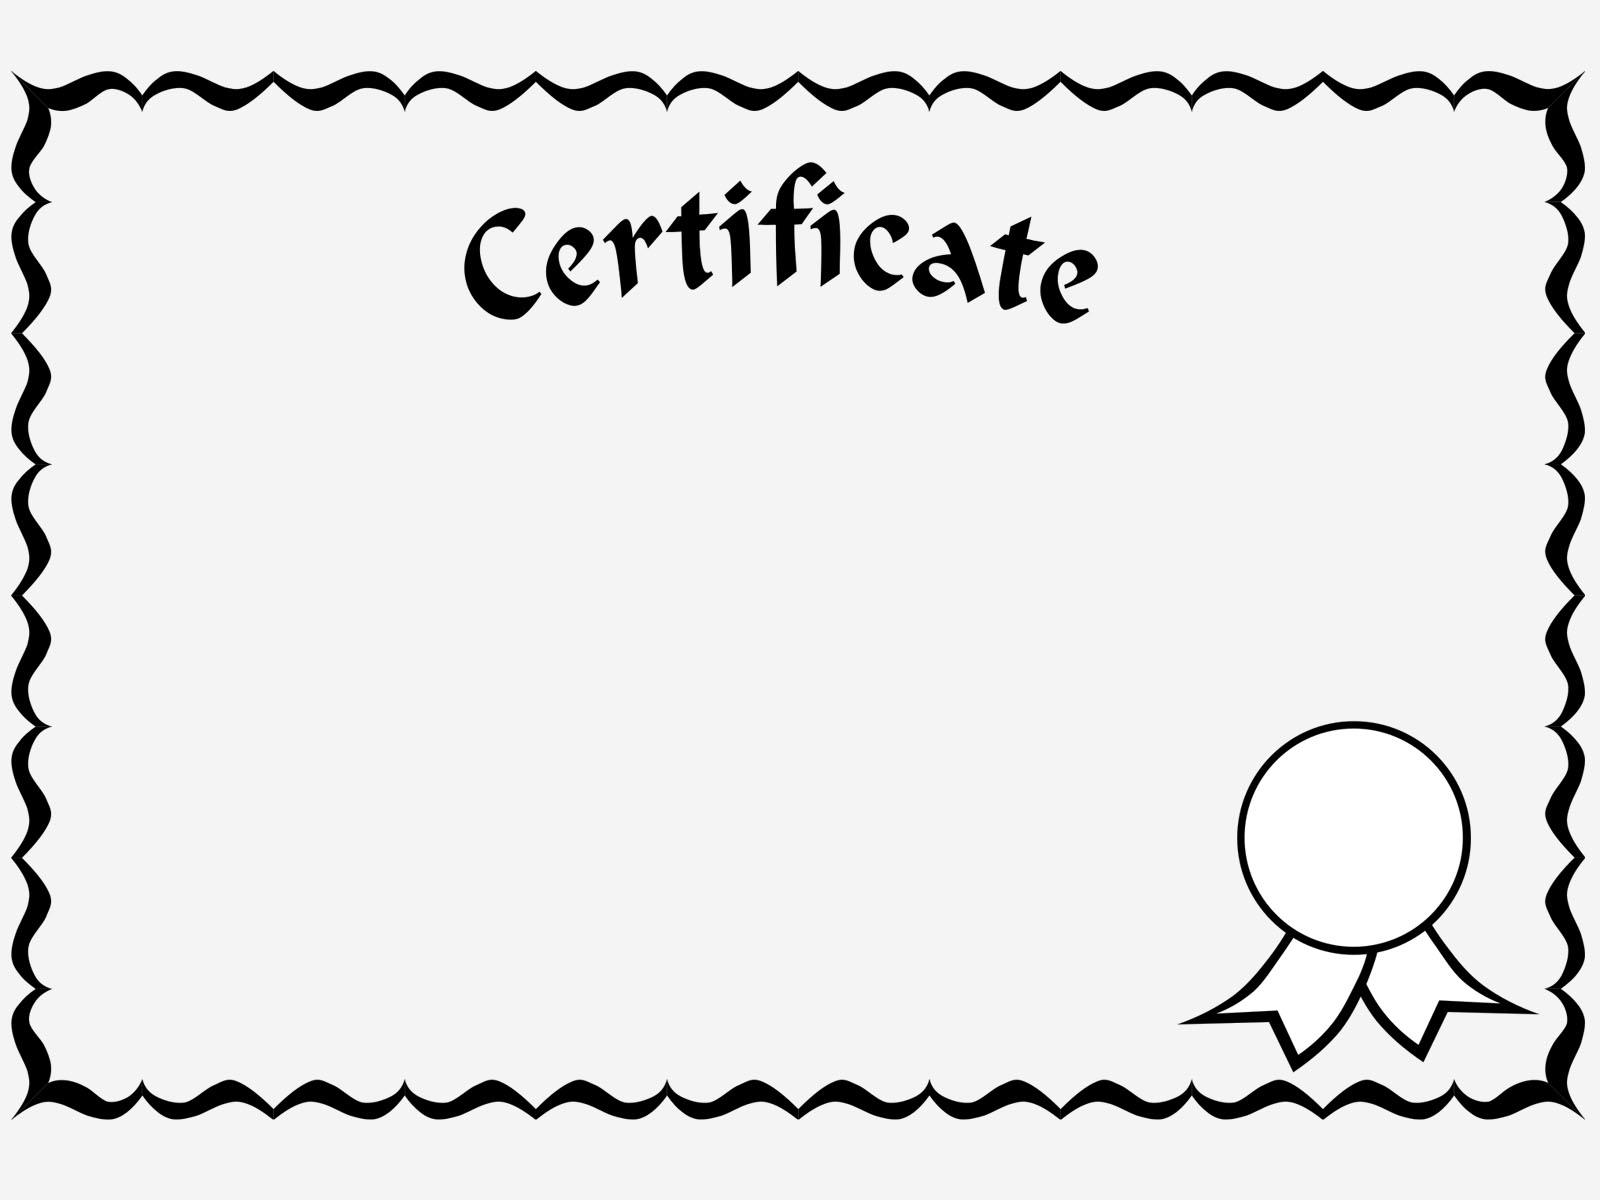 Free Graduation Certificate Template diploma certificate ppt – Graduation Certificate Template Free